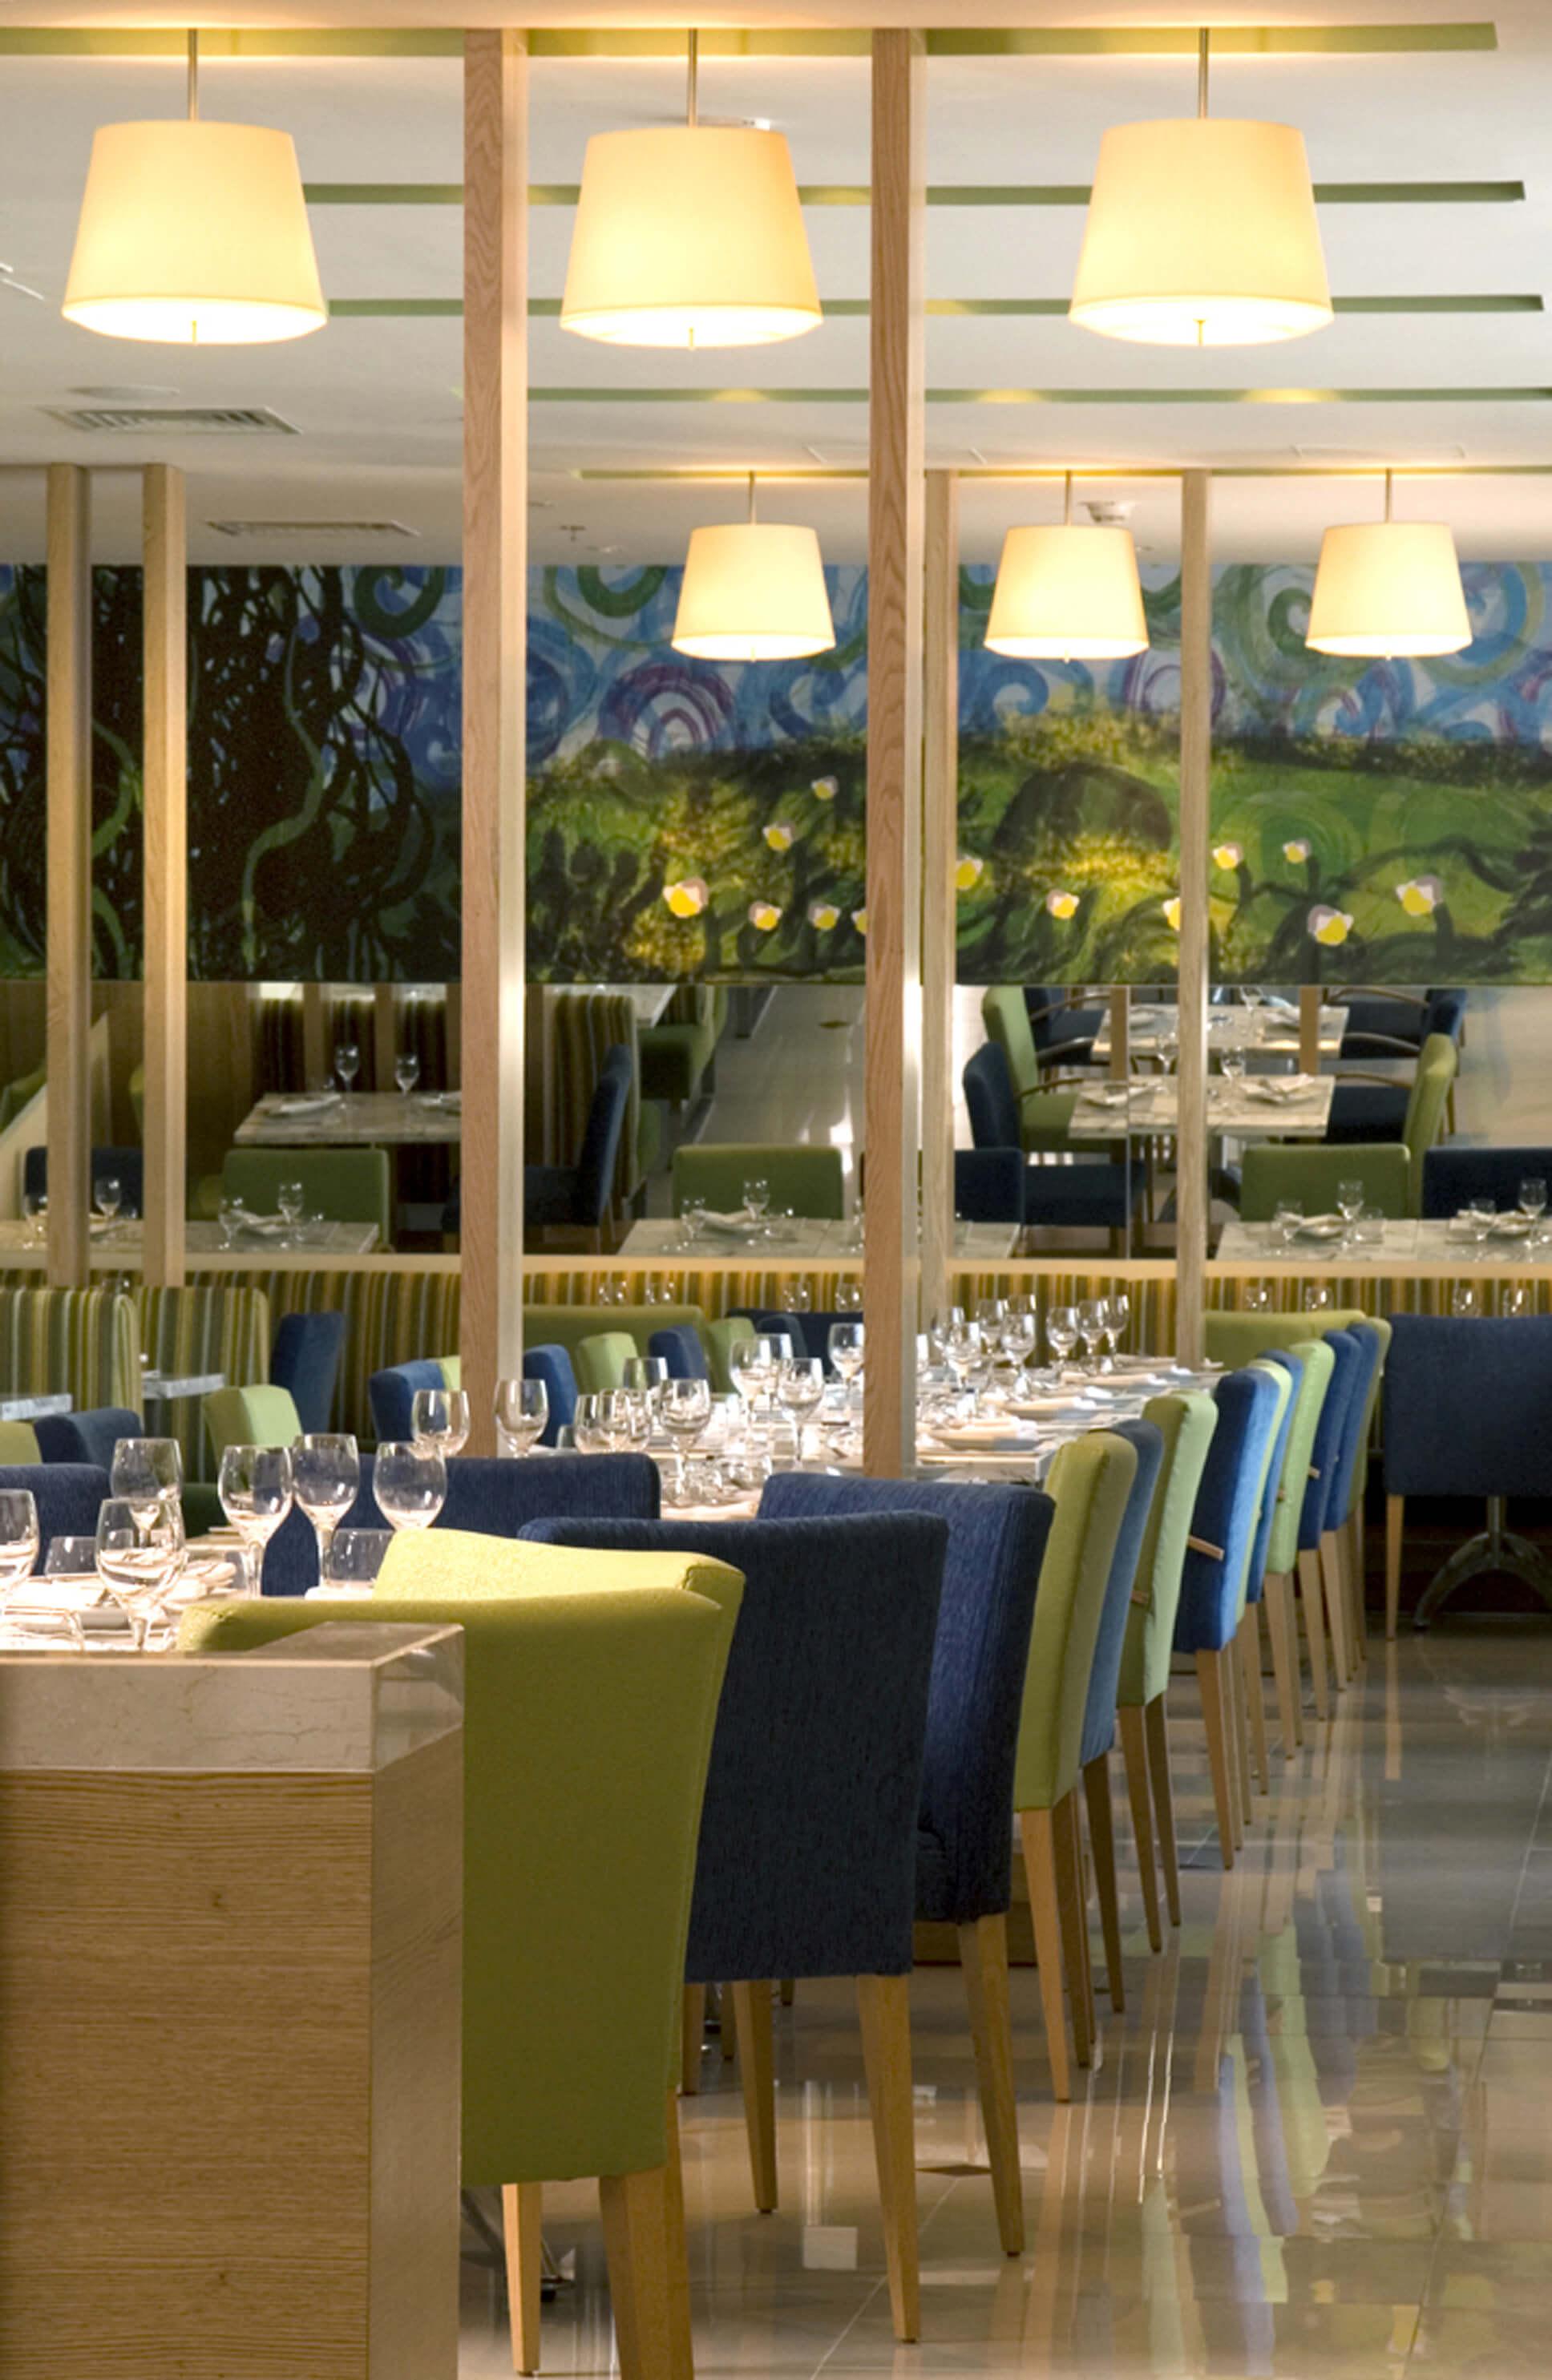 Boutique Hotel Bistro Dining Area InteriorSense Commercial Interior Design Bude Cornwall UK